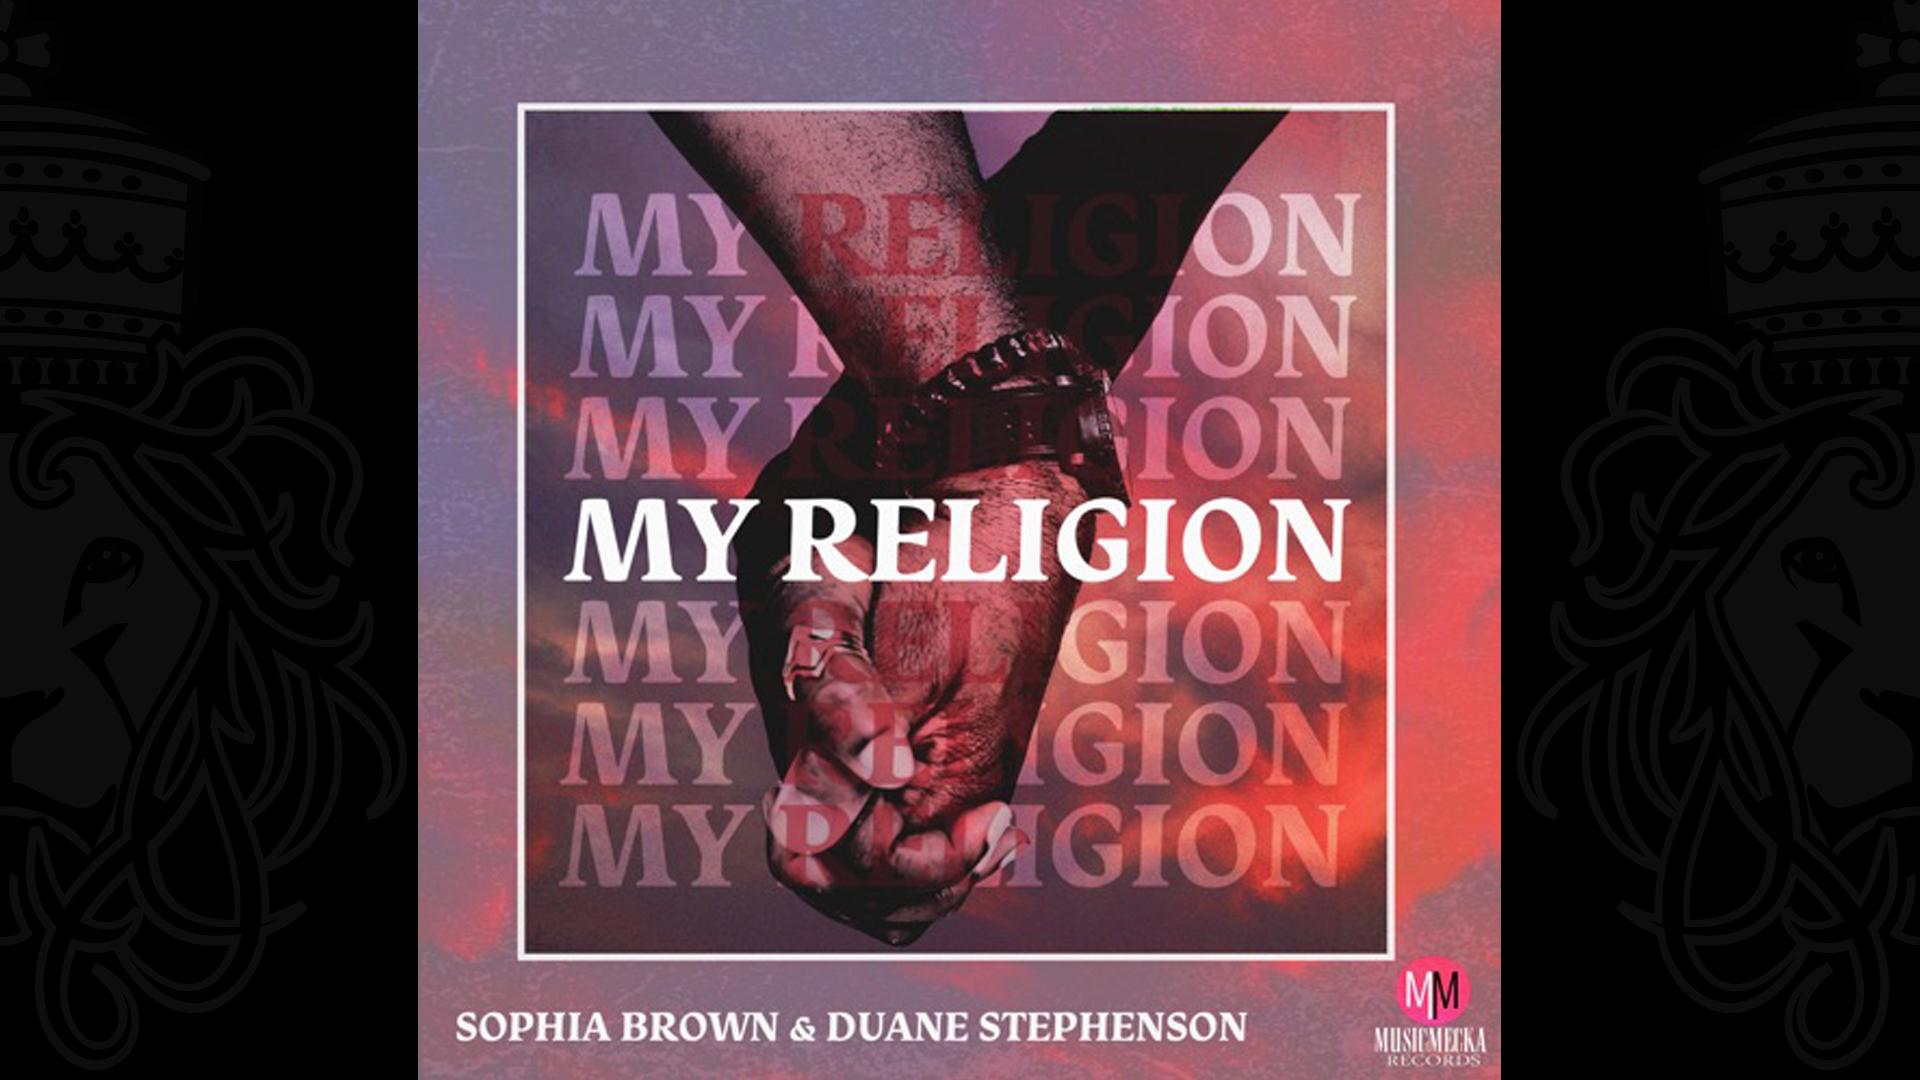 Sophia Brown & Duane Stephenson - My Religion